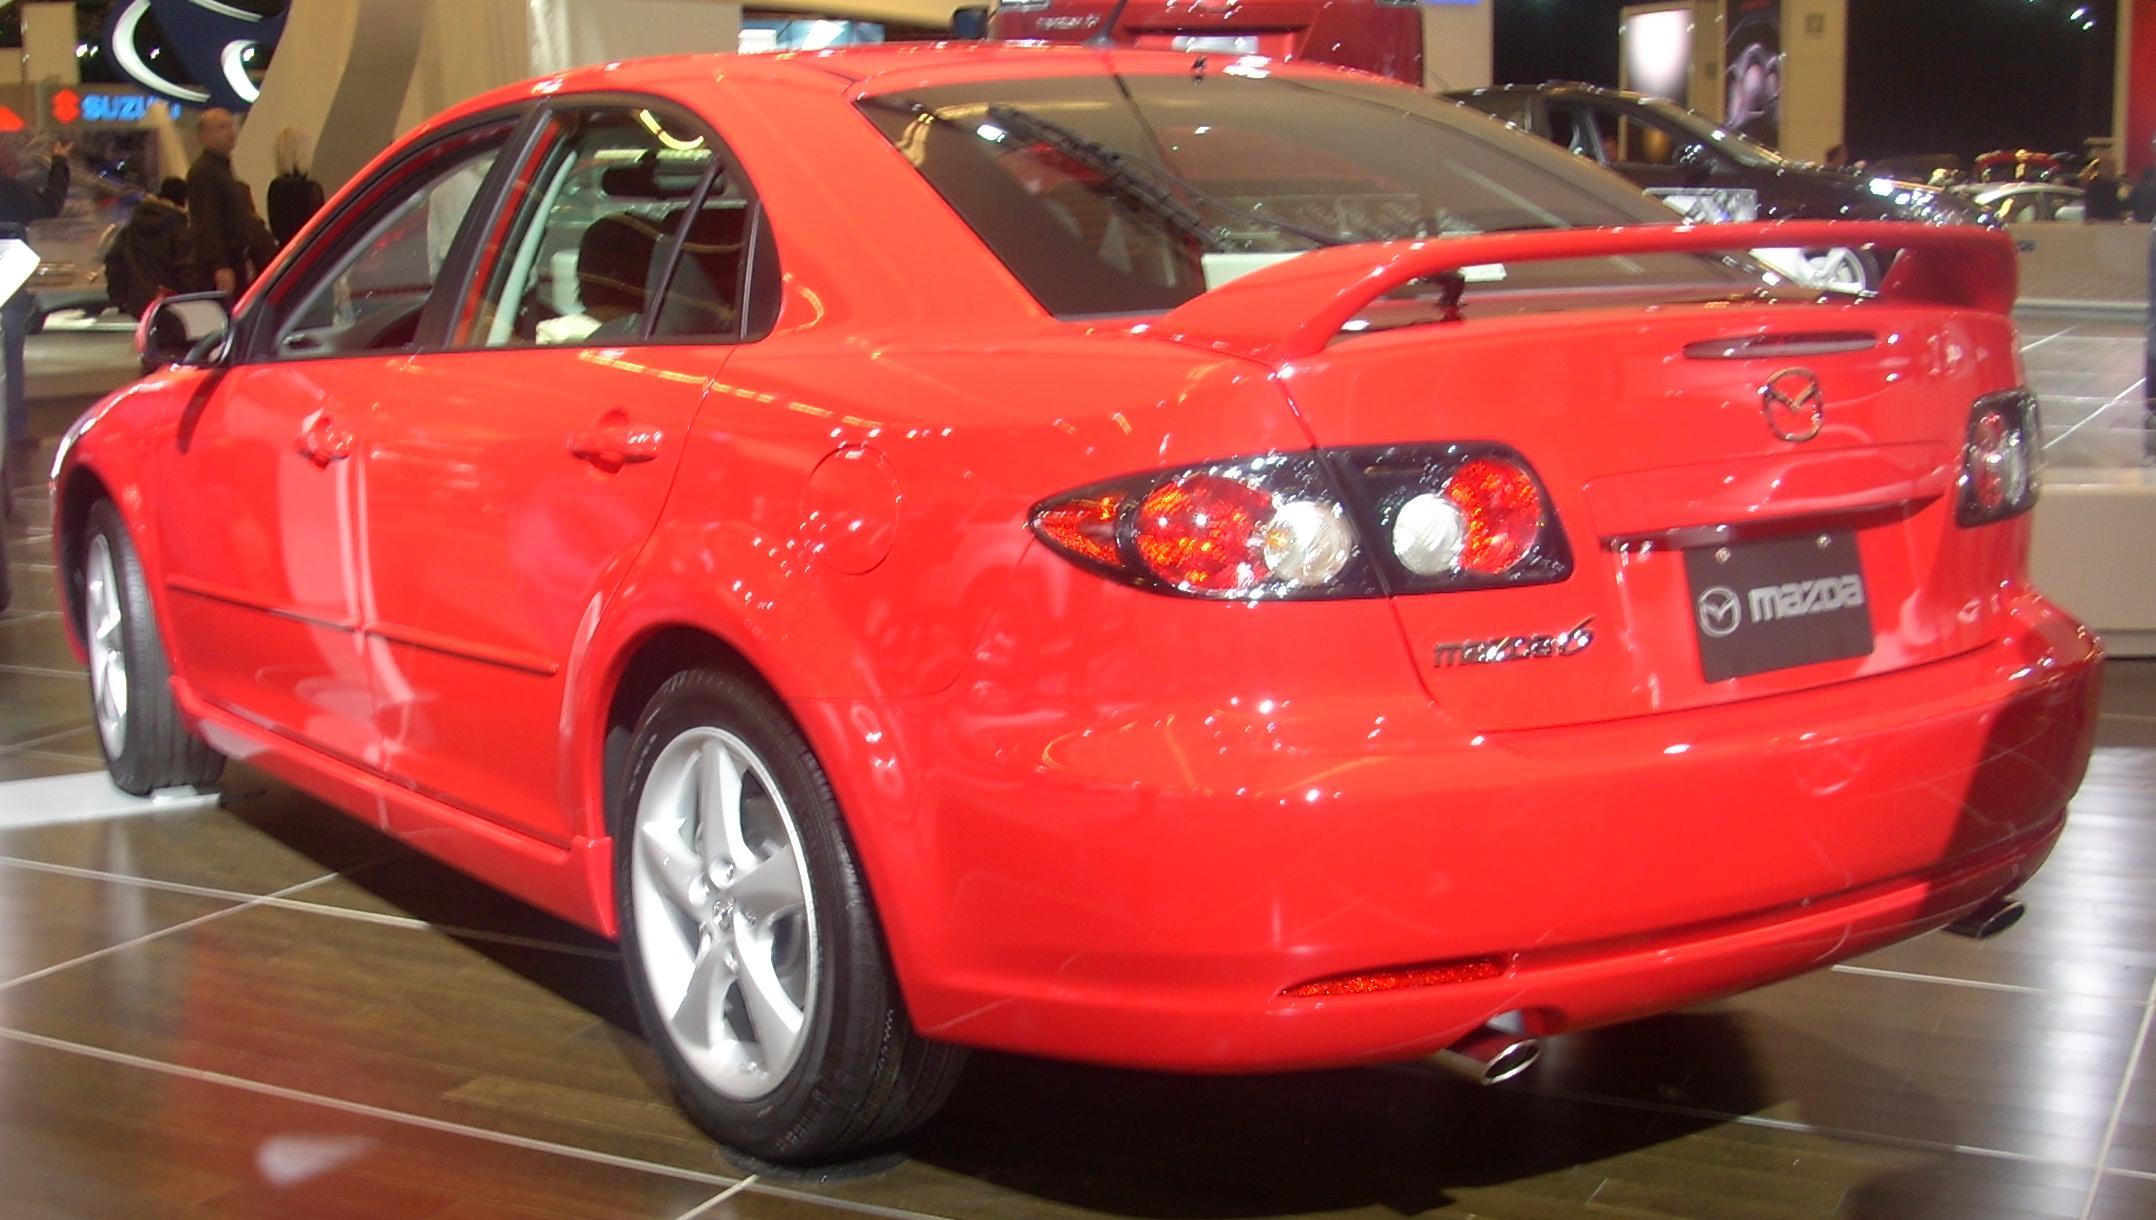 file:'08 mazda6 hatchback (montreal) - wikimedia commons